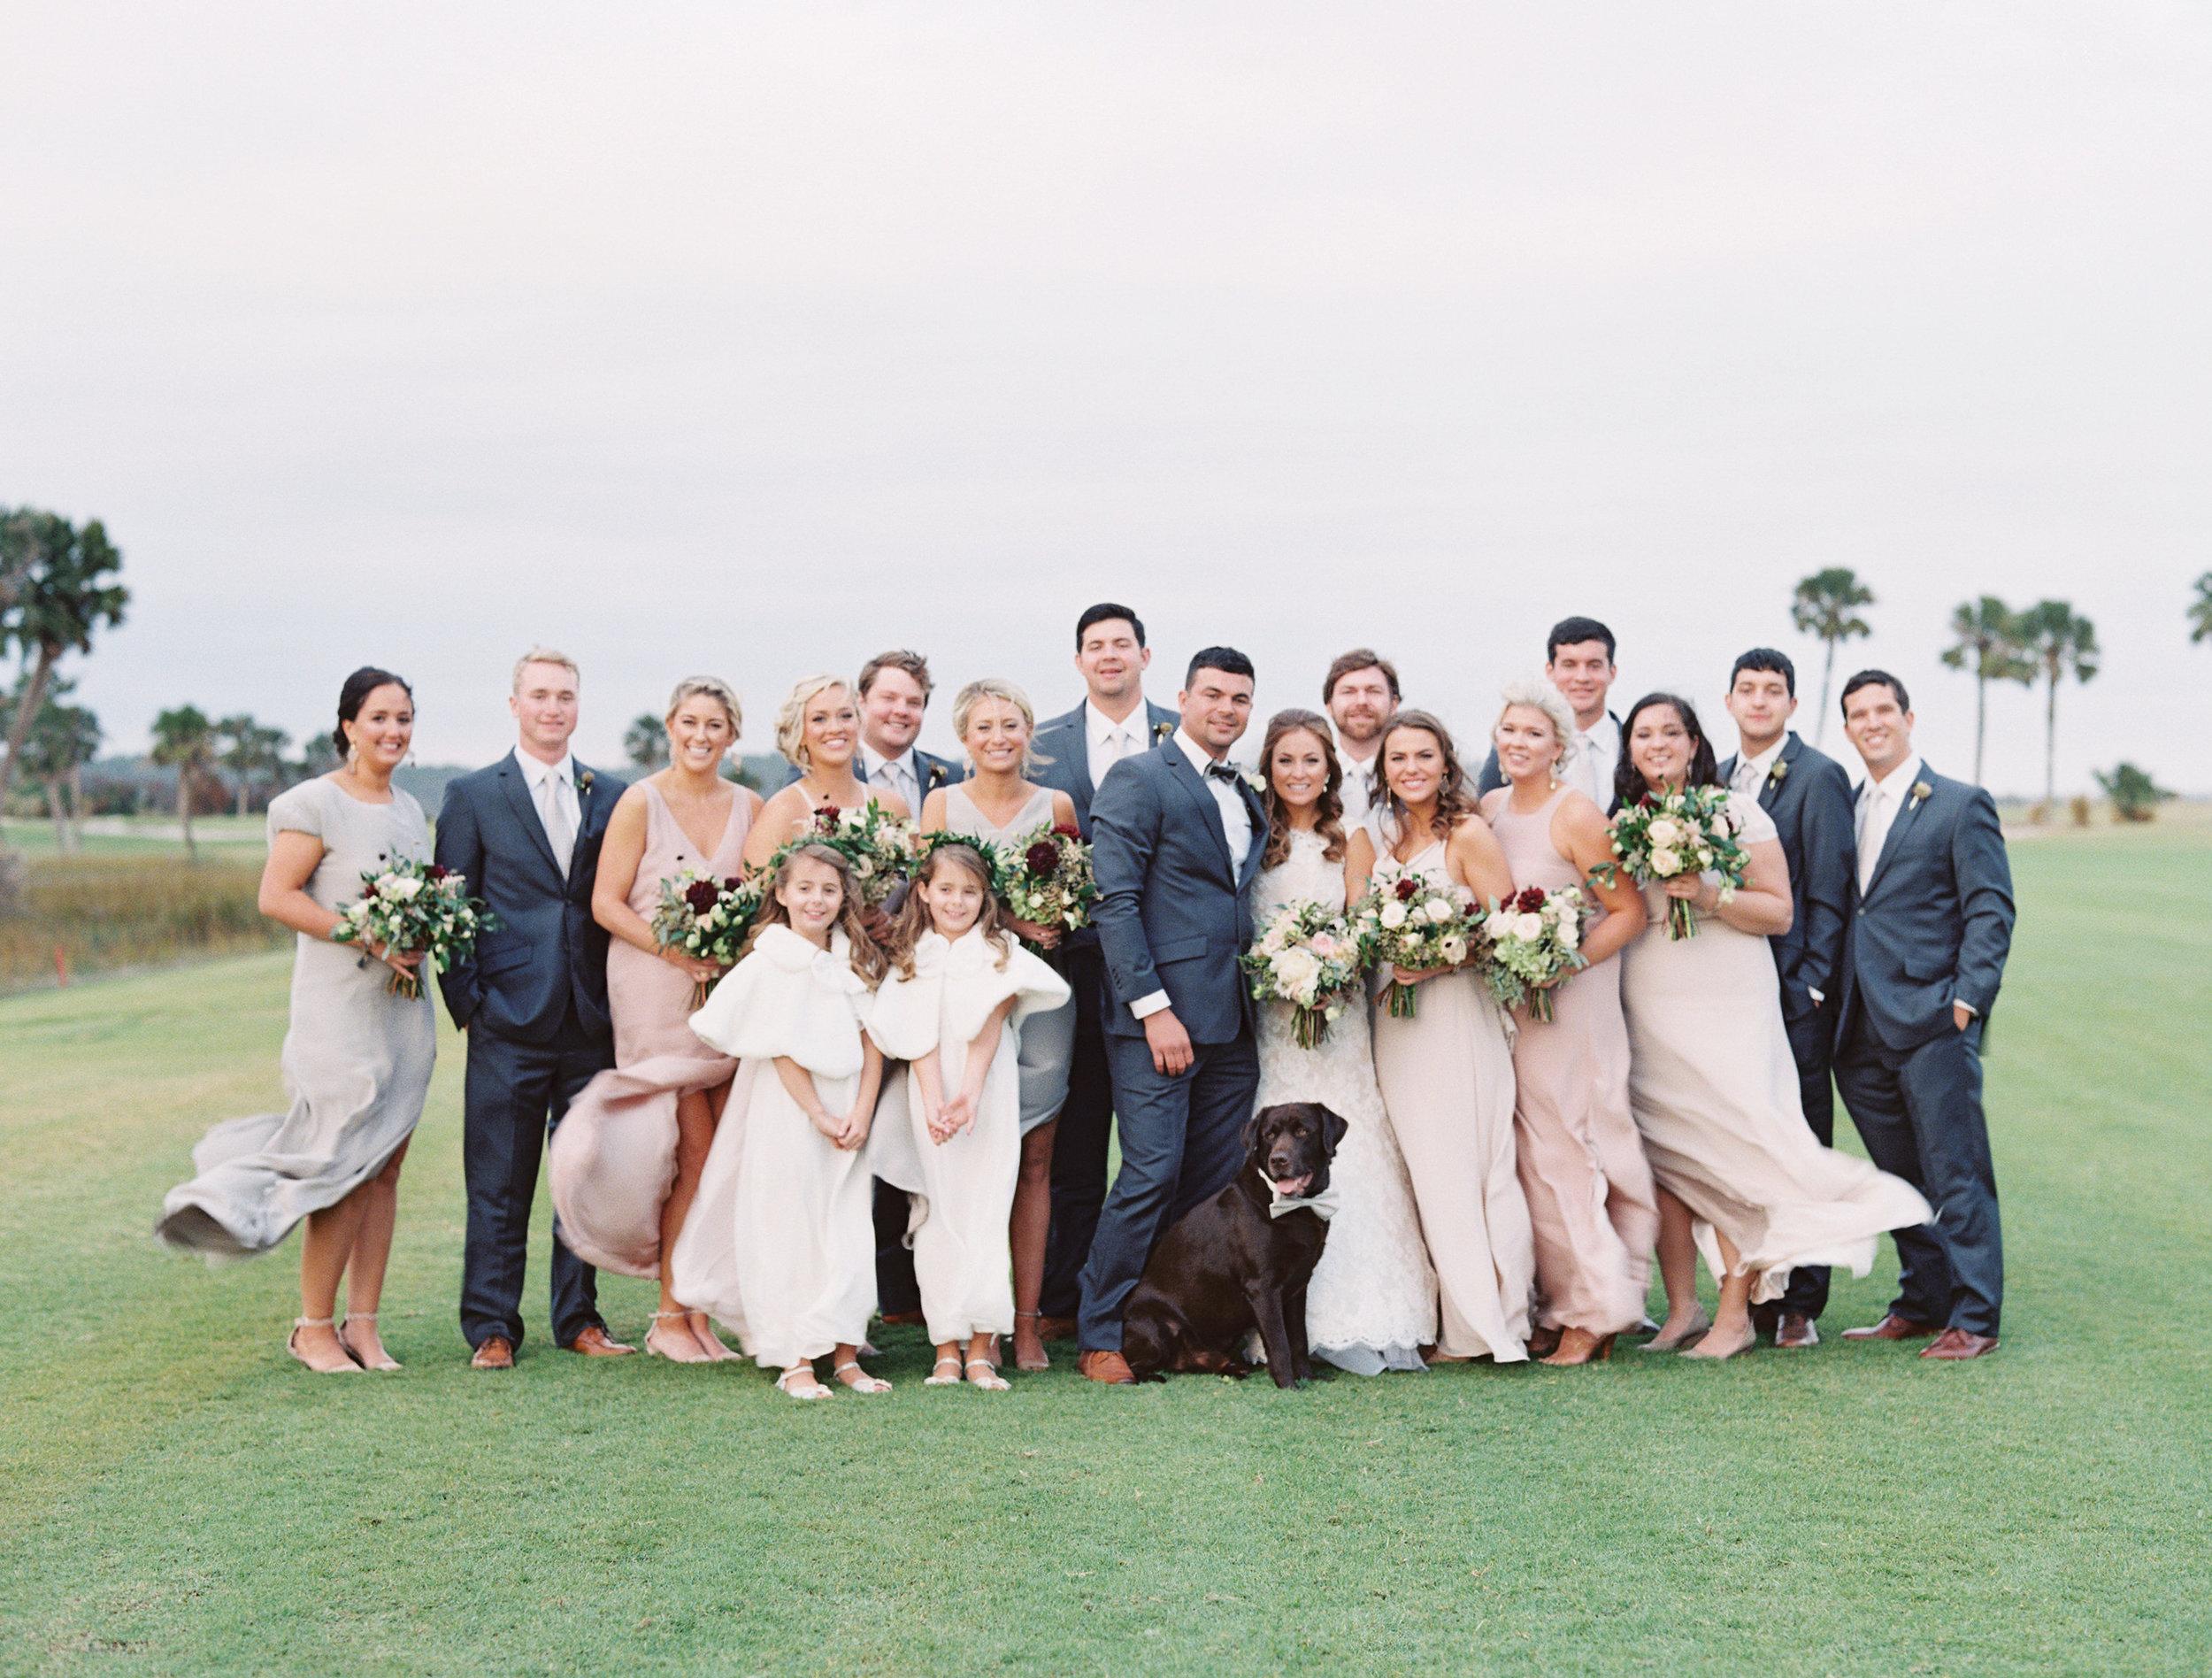 kate & Nick - Fripp Island wedding